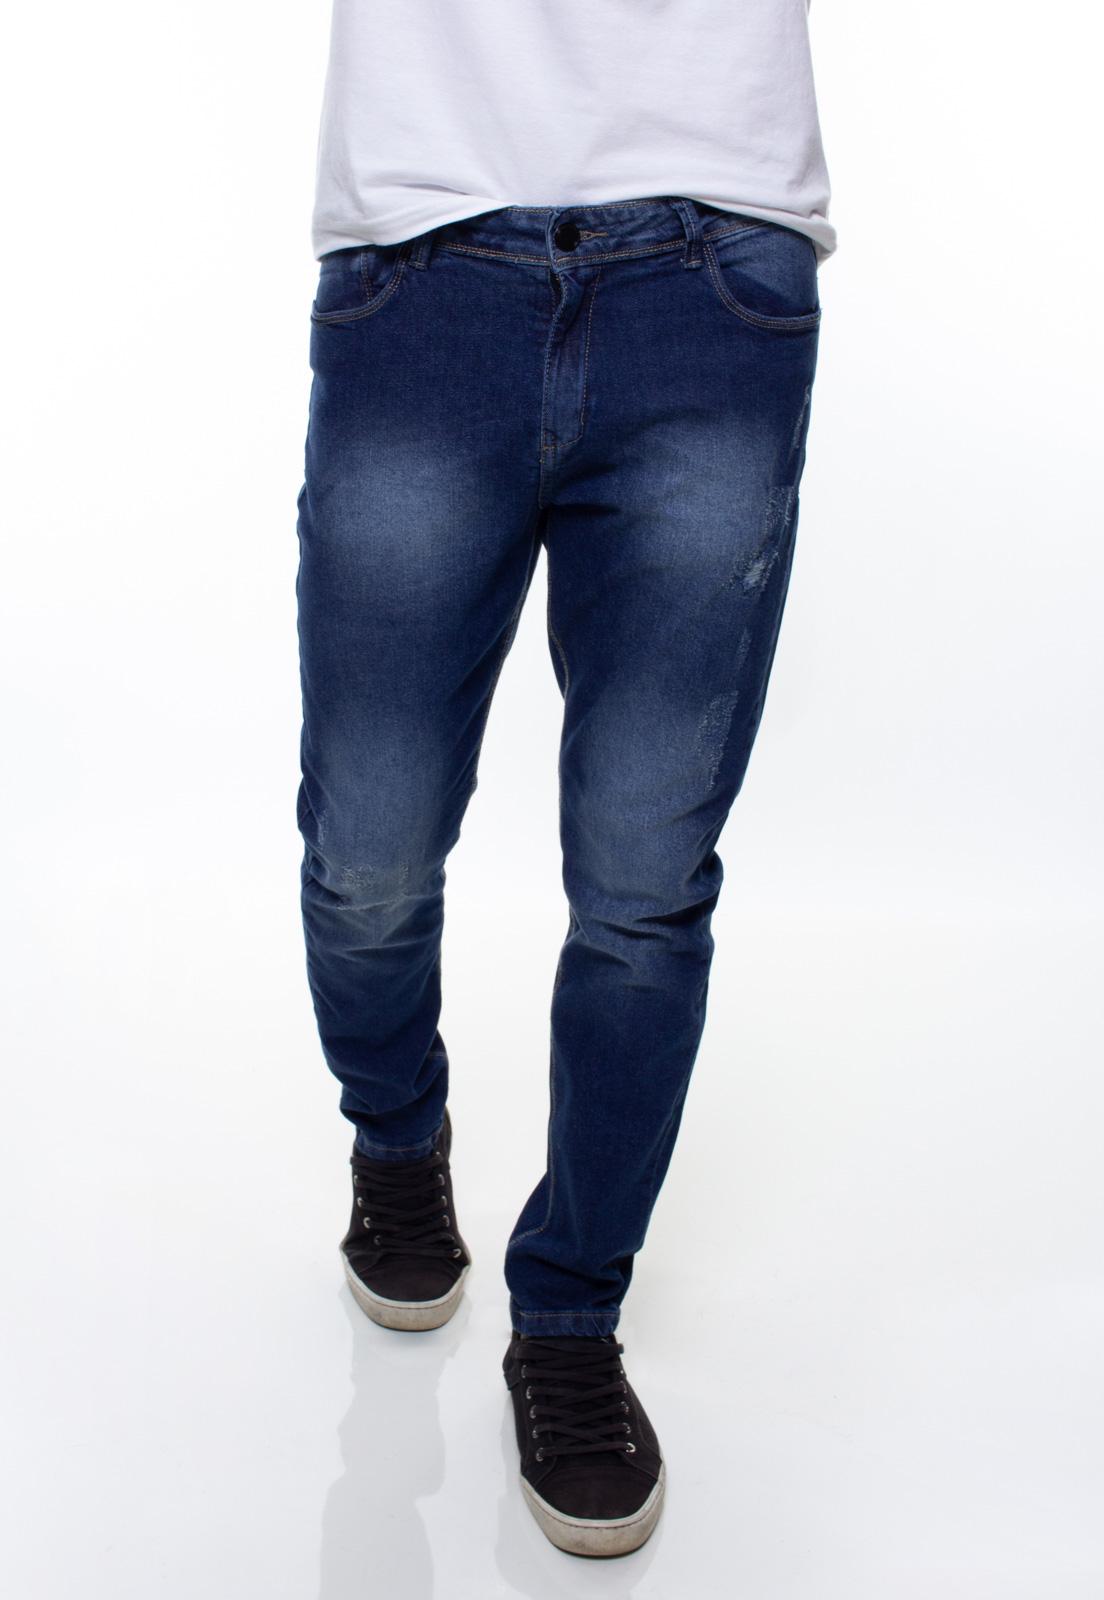 Calça Confort Jeans Masculina Crocker - 48049  - CROCKER JEANS